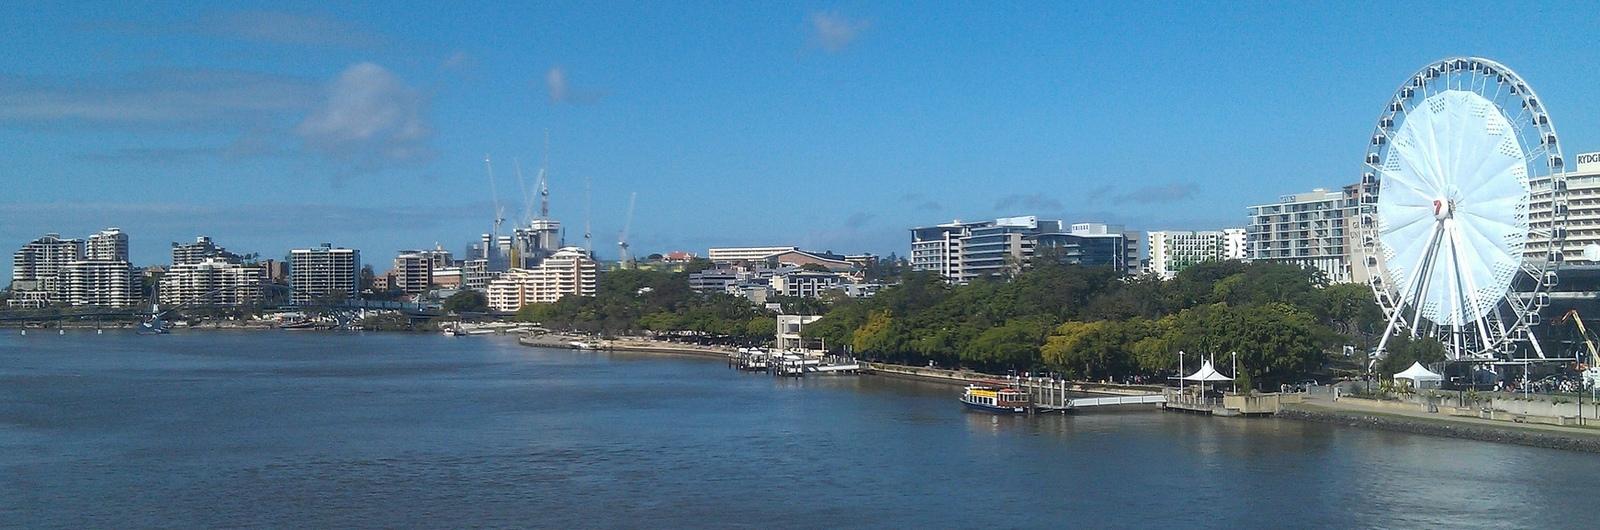 australia brisbane city header